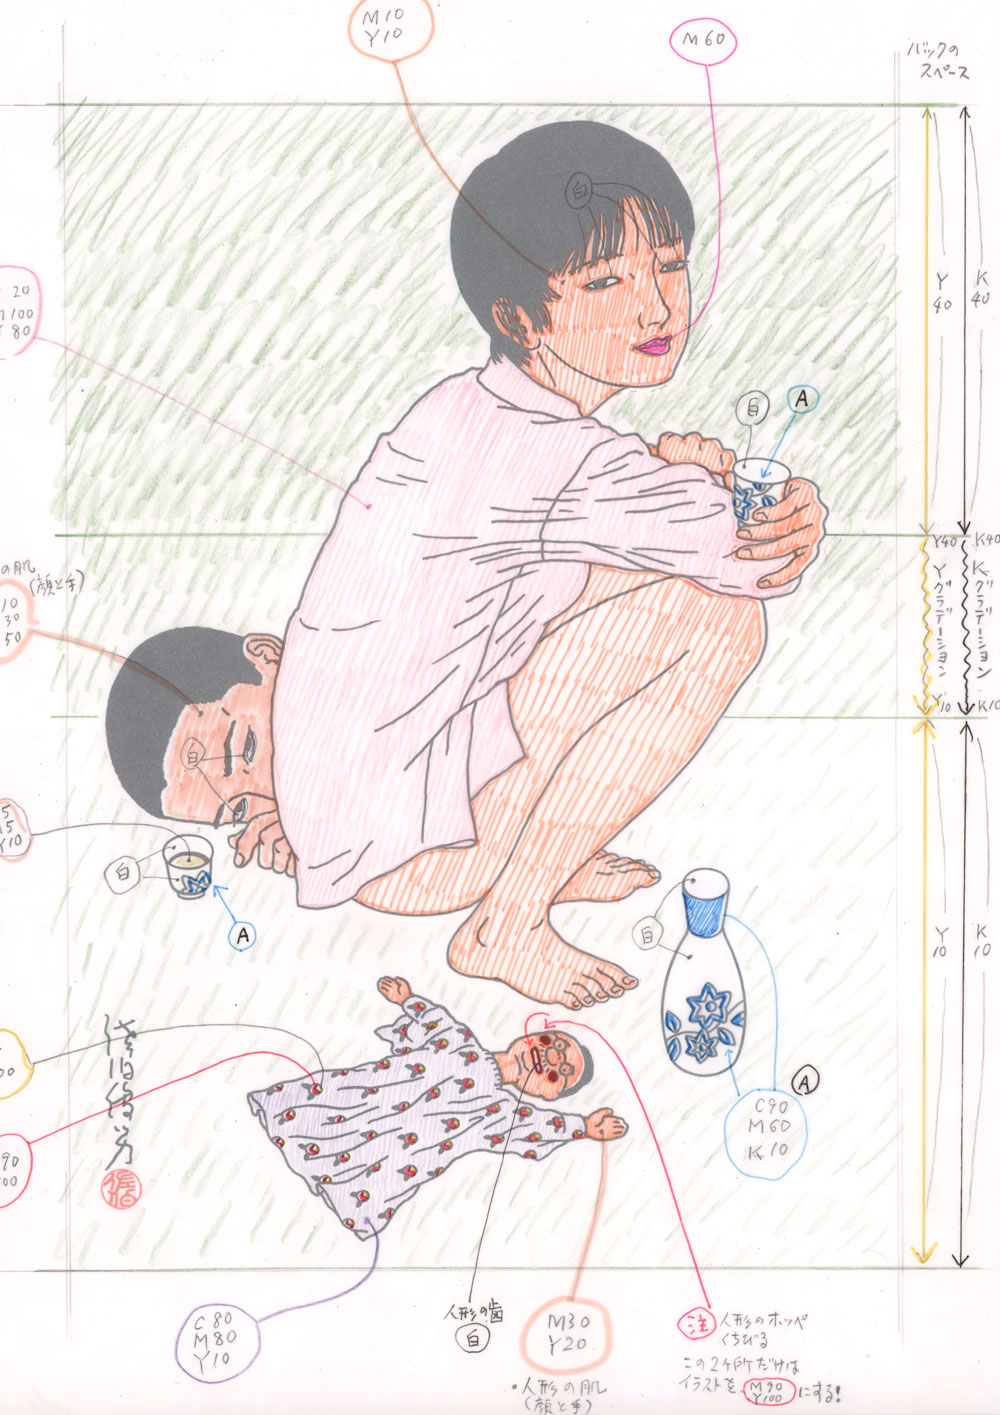 Toshio SaekiZanjou, 2015Ink on vellum.12.5 x 17.5 in. unframed